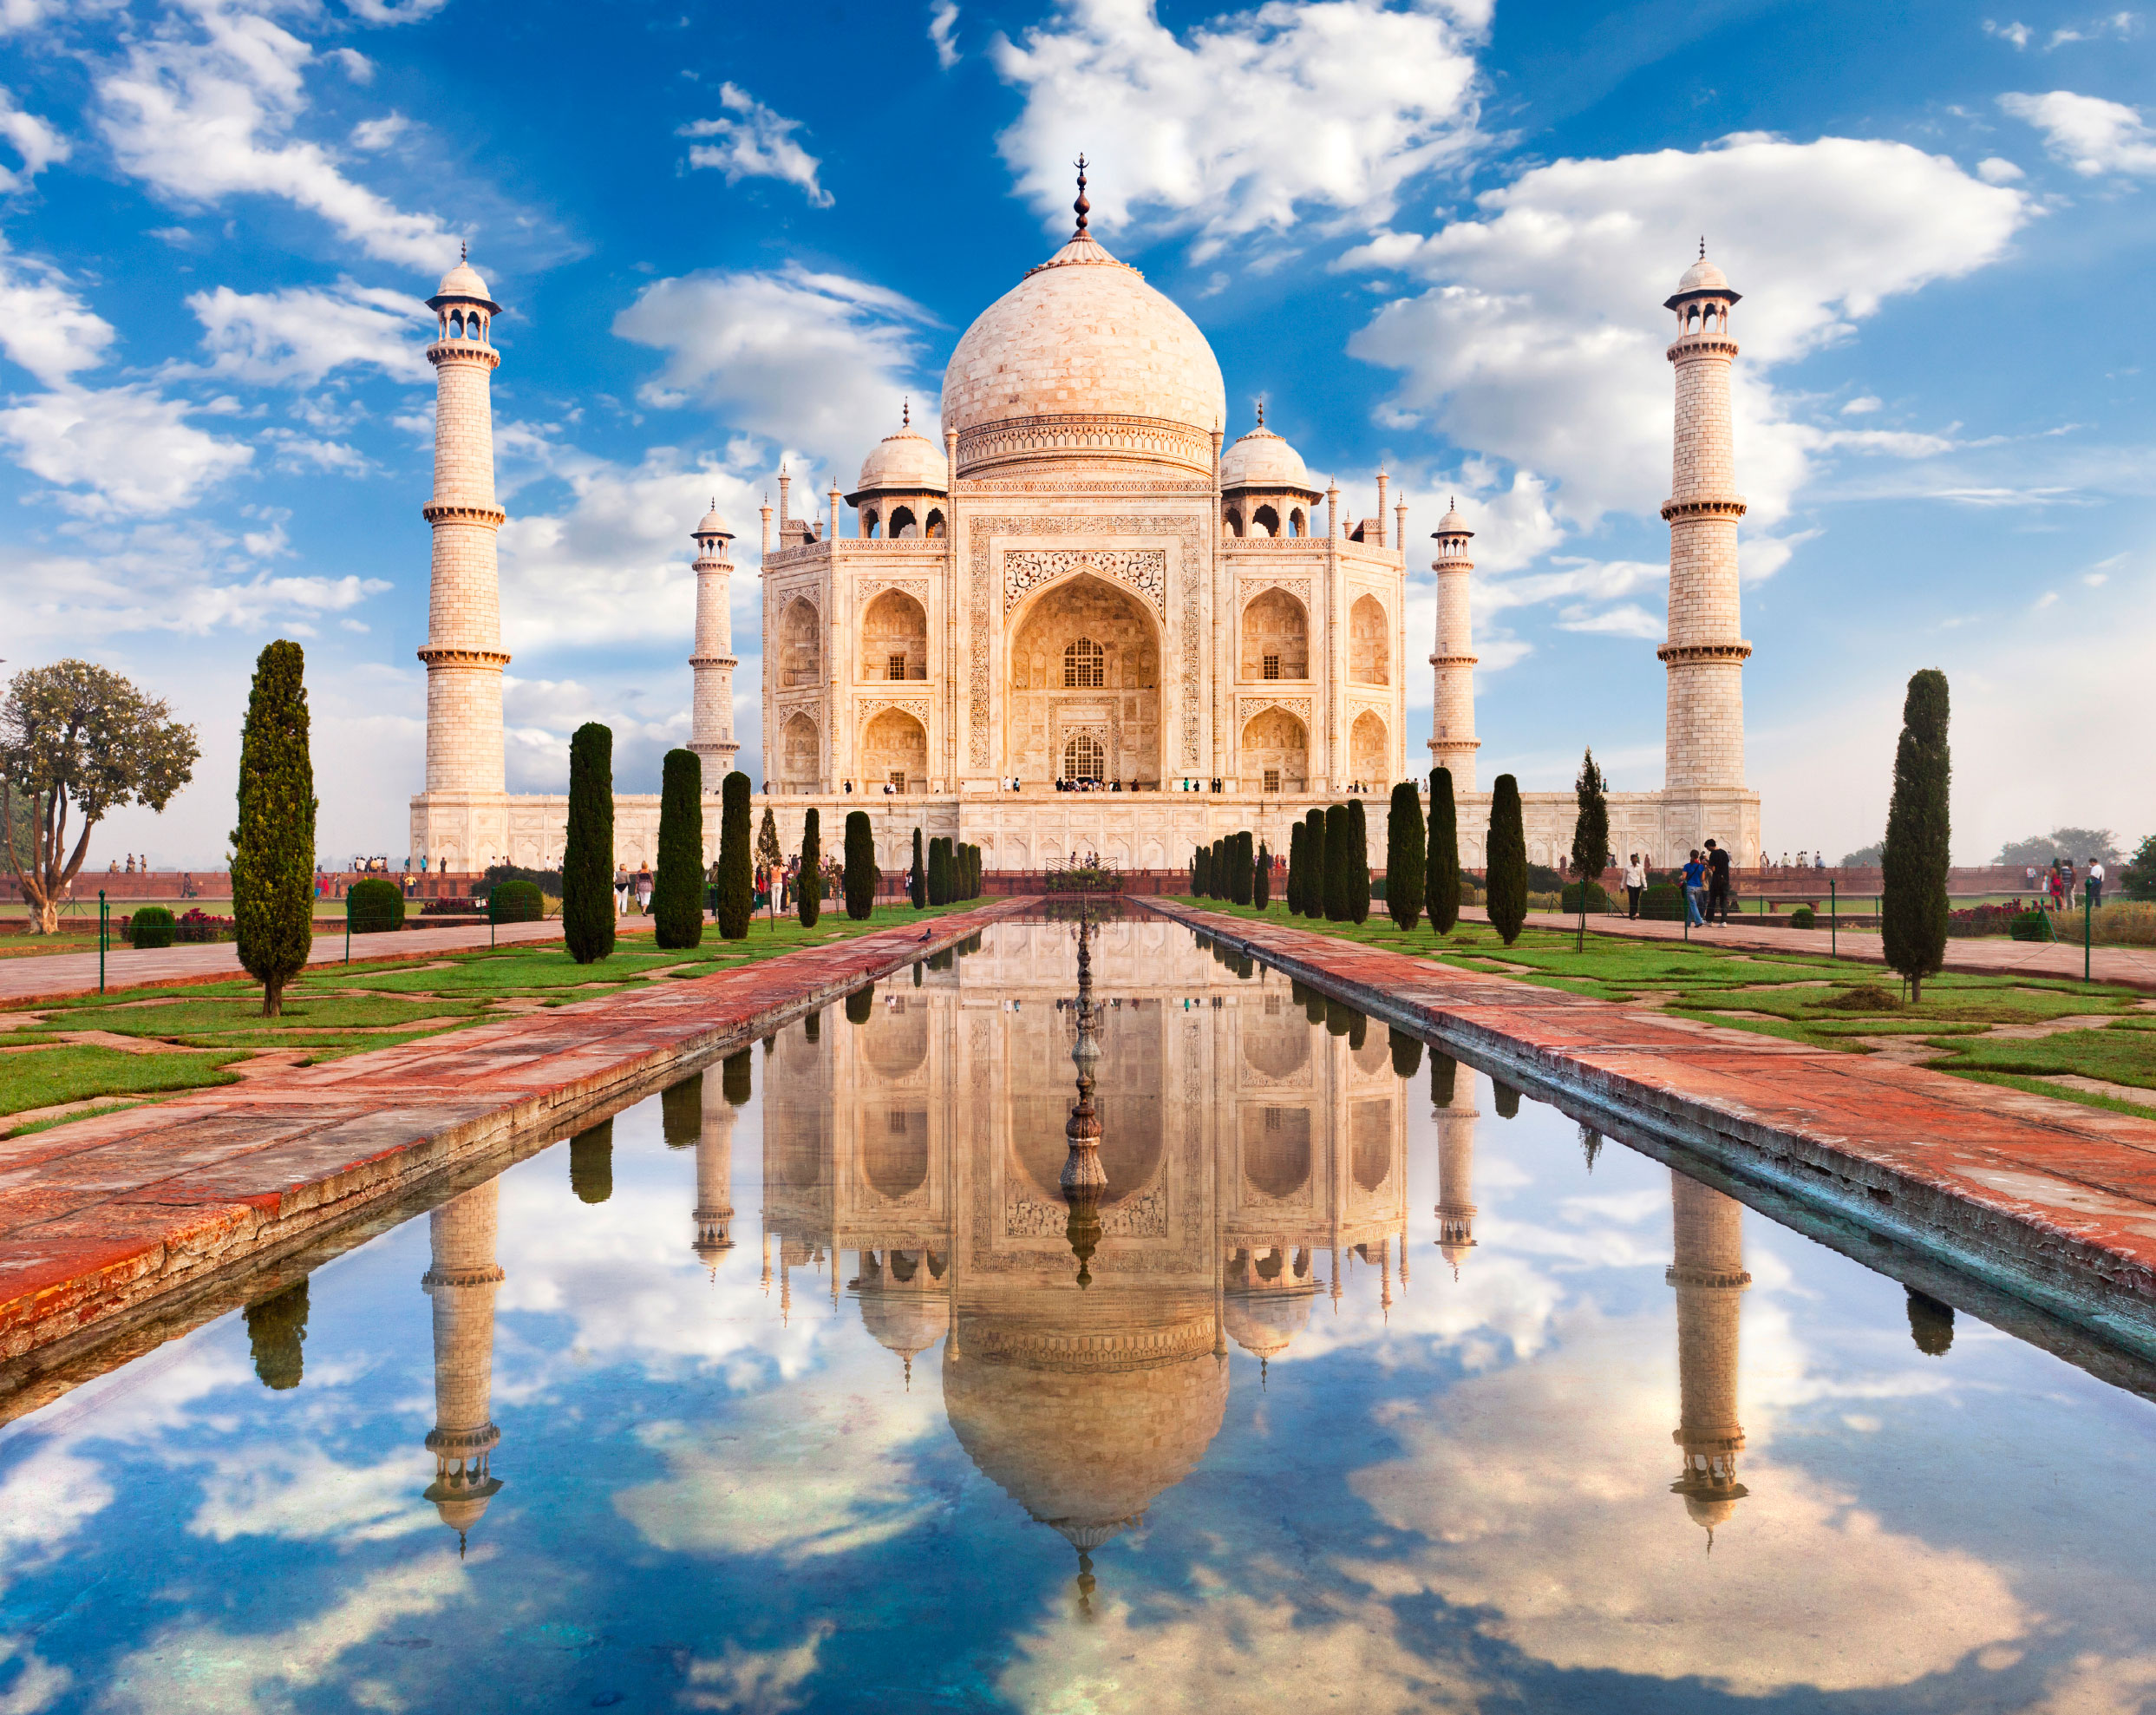 FriendlyPlanet_Taj-Mahal-iStock-18106264